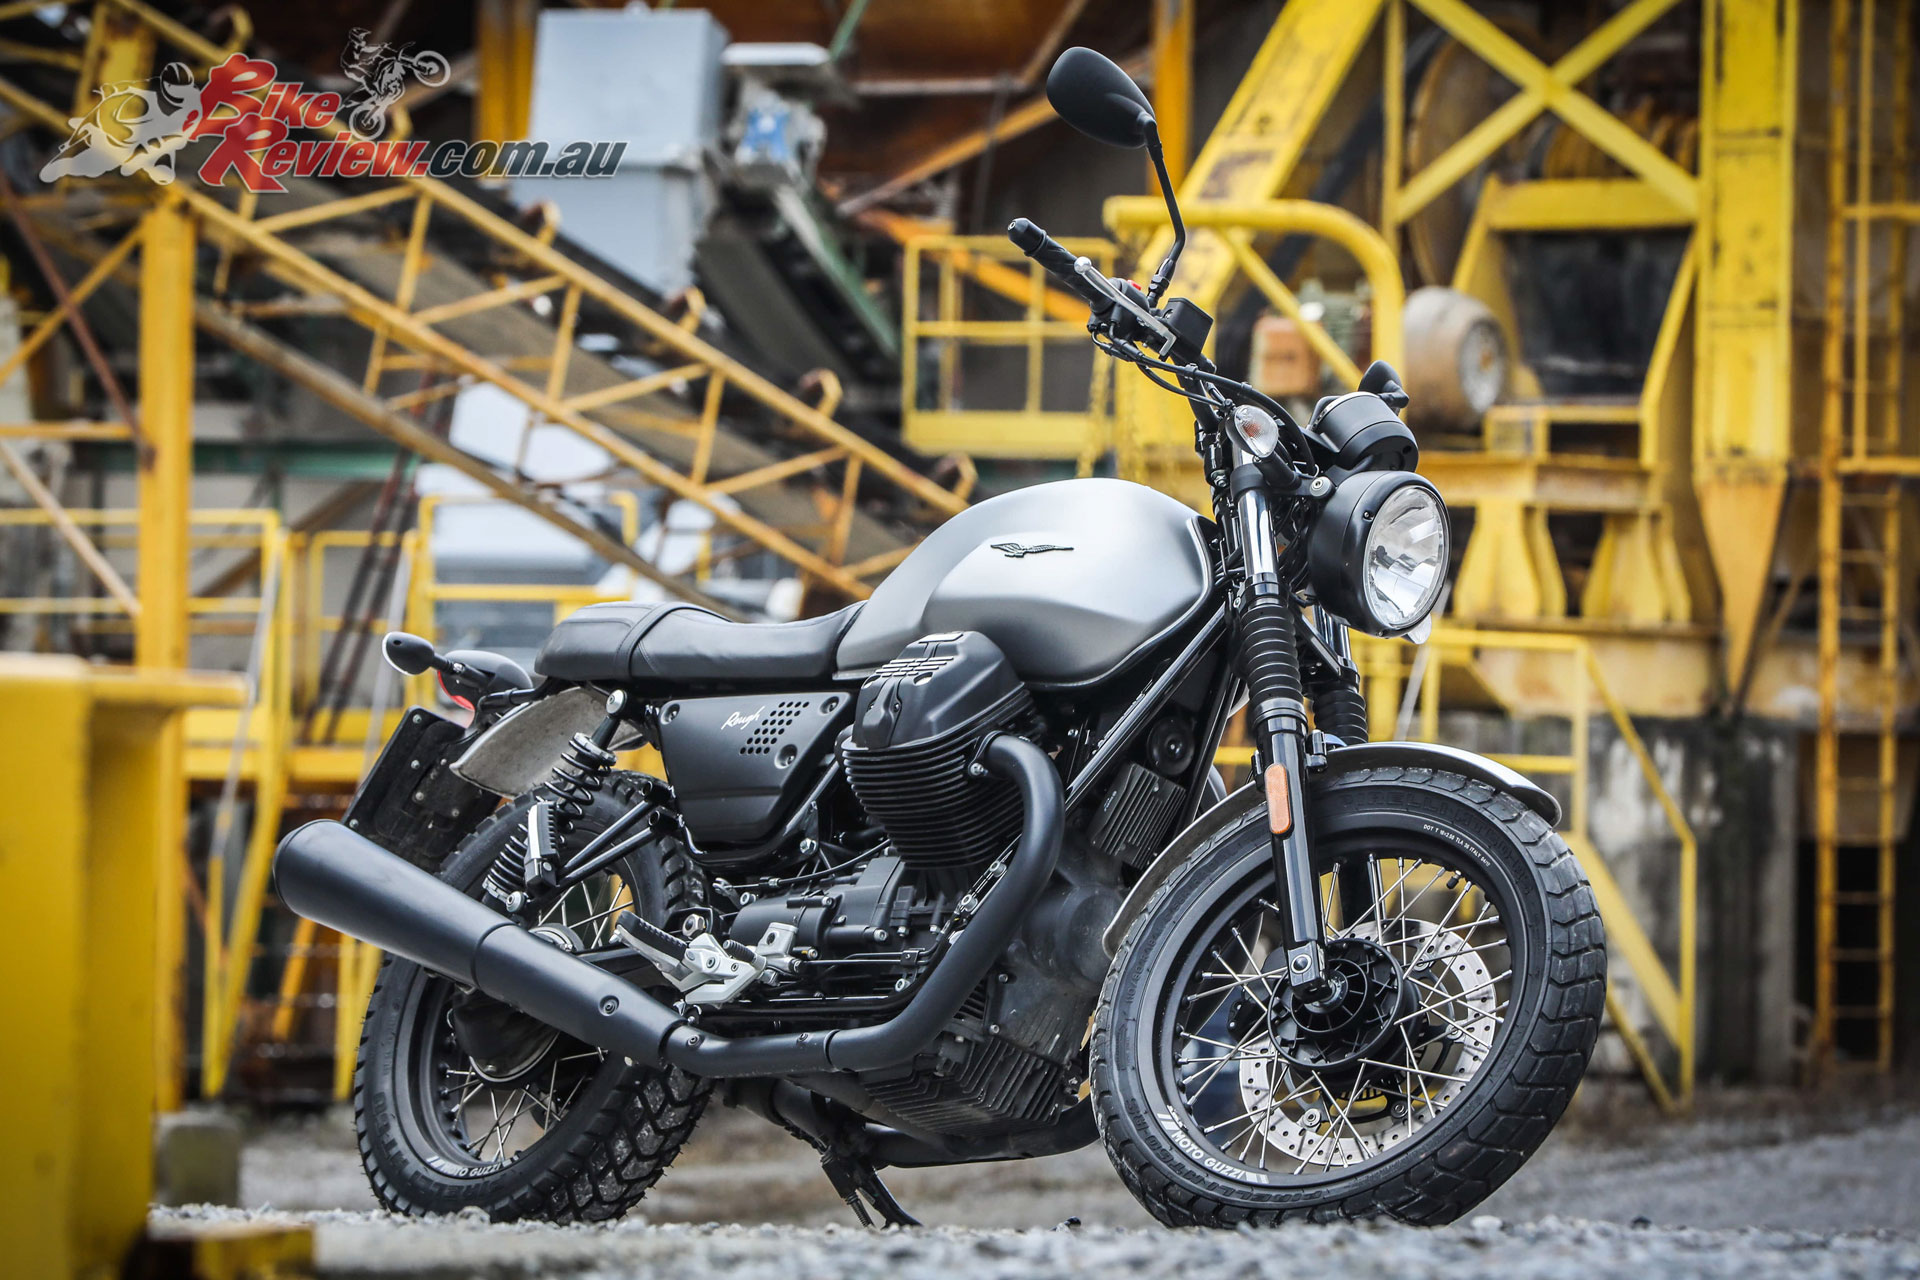 moto guzzi v7 iii limited edition range bike review. Black Bedroom Furniture Sets. Home Design Ideas